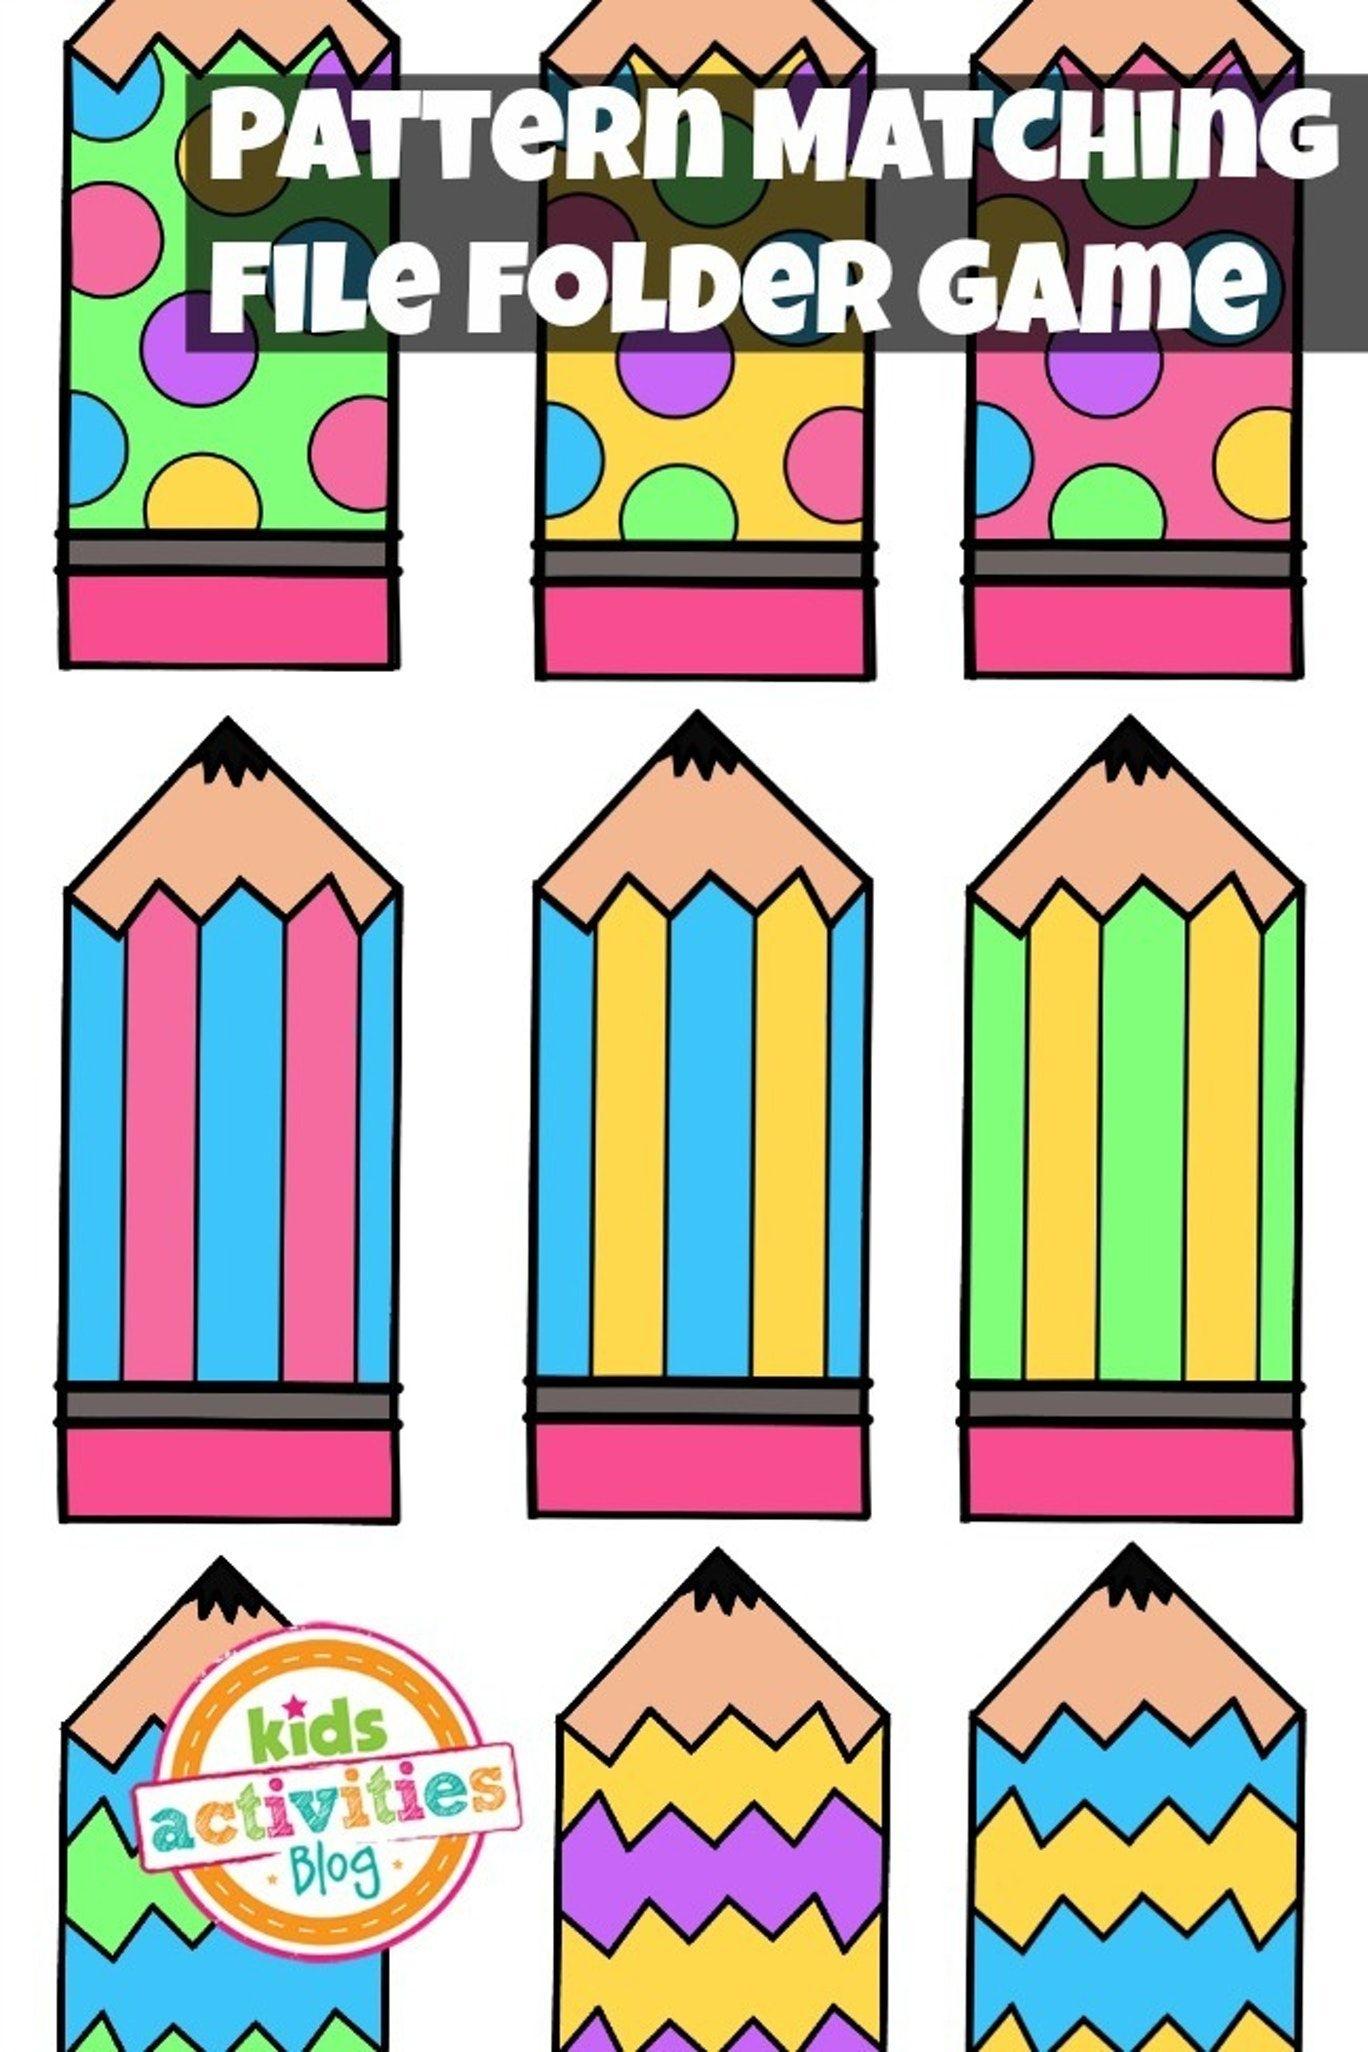 Pattern Matching Free Printable File Folder Game For Preschoolers - File Folder Games For Toddlers Free Printable